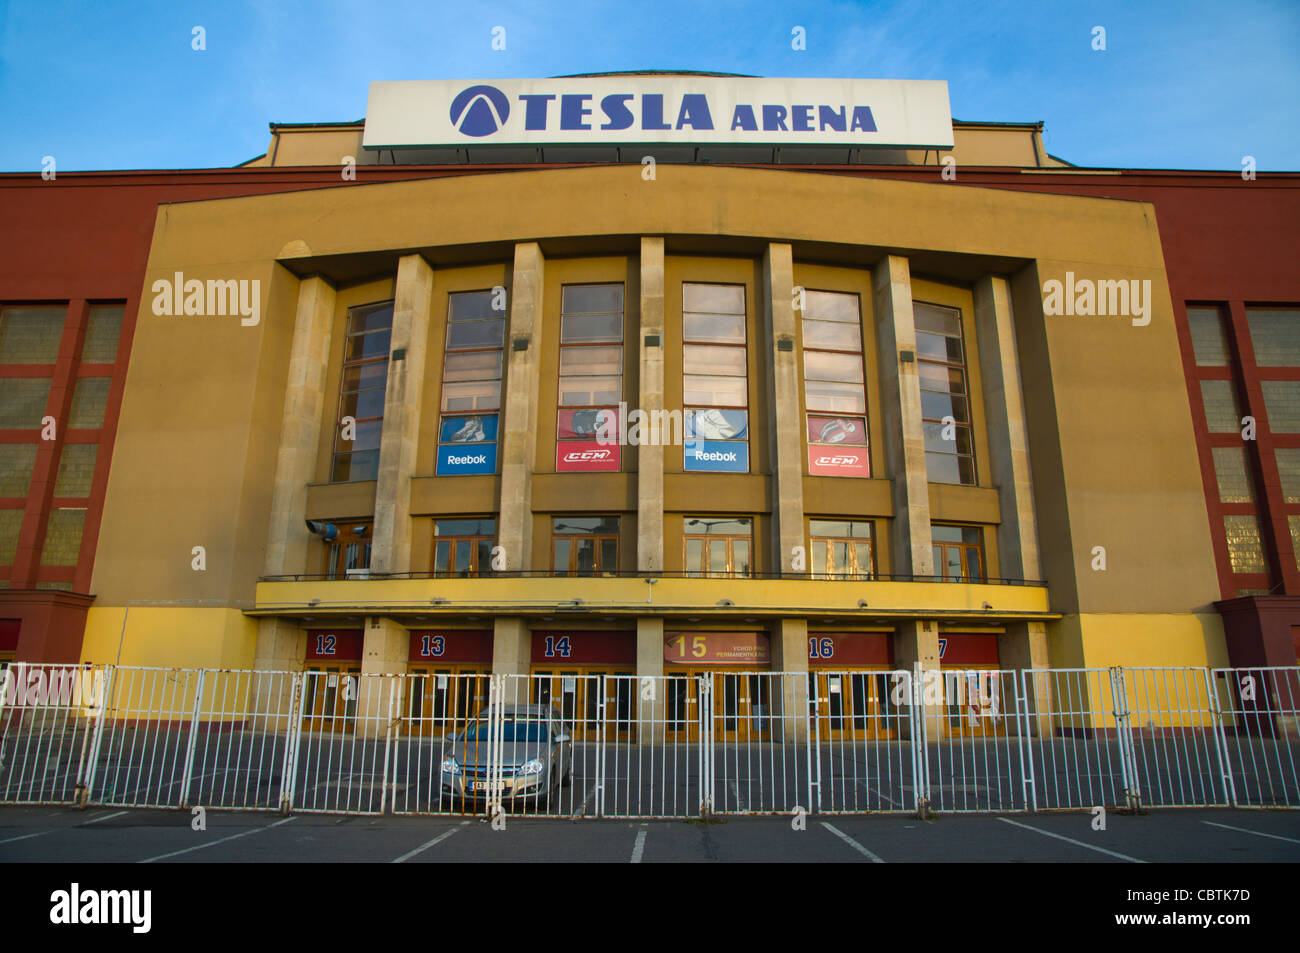 Tesla Arena ice hockey hall esterno Vystaviste esposizioni Holesovice quartiere Praga Repubblica Ceca Europa Immagini Stock